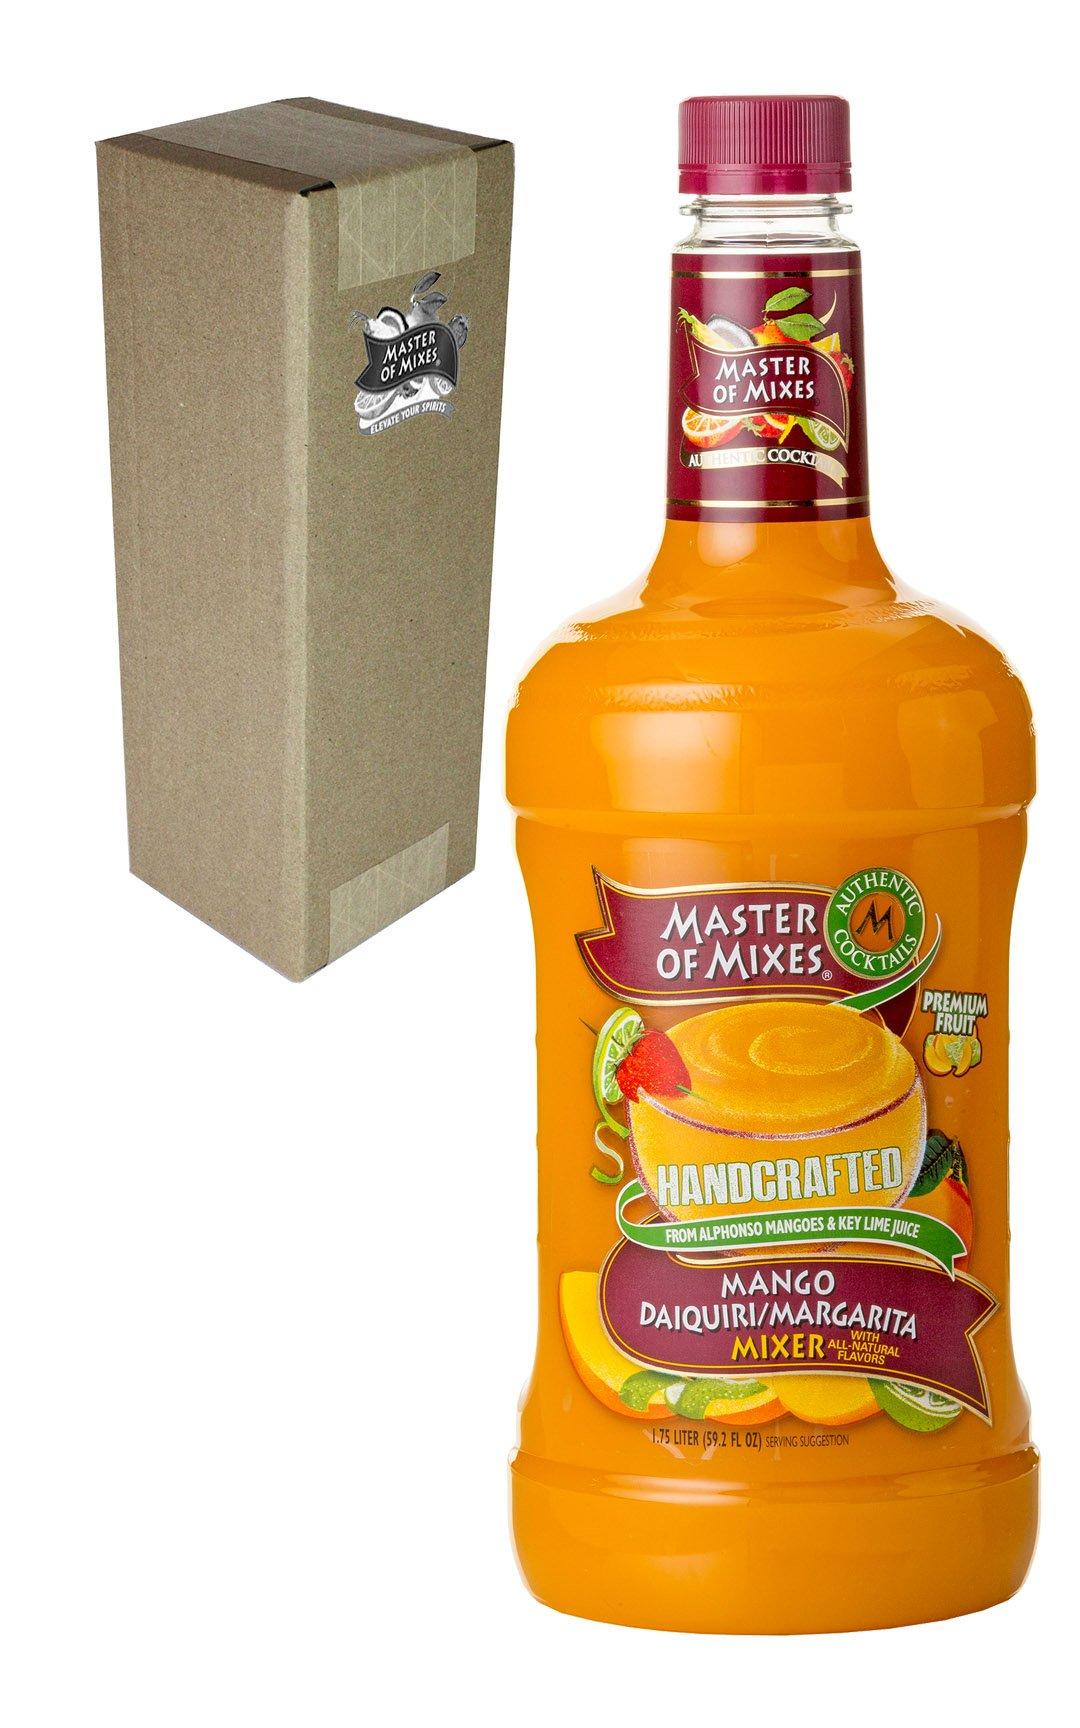 Master of Mixes Mango Daiquiri/Margarita Drink Mix, Ready to Use, 1.75 Liter Bottle (59.2 Fl Oz), Individually Boxed